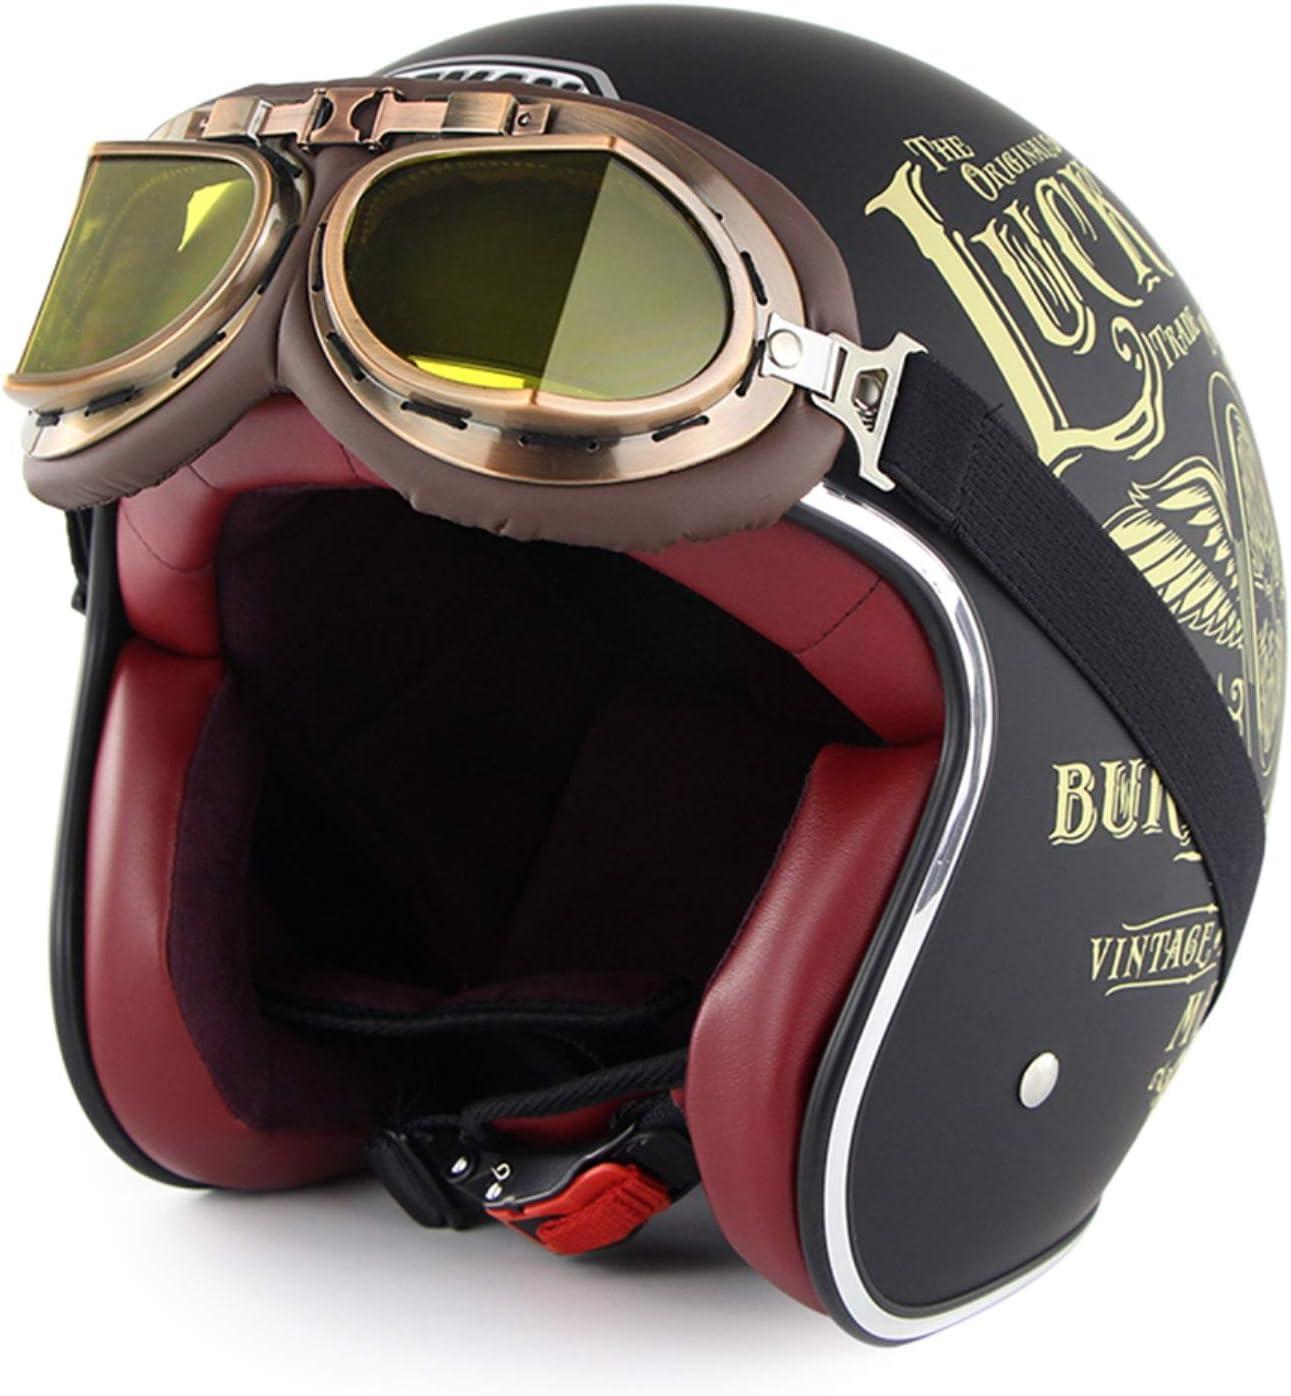 ,1,M Evin 3//4 Jethelm Retro Harley Motorrad Jethelm DOT Approved Men and Women Send Goggles